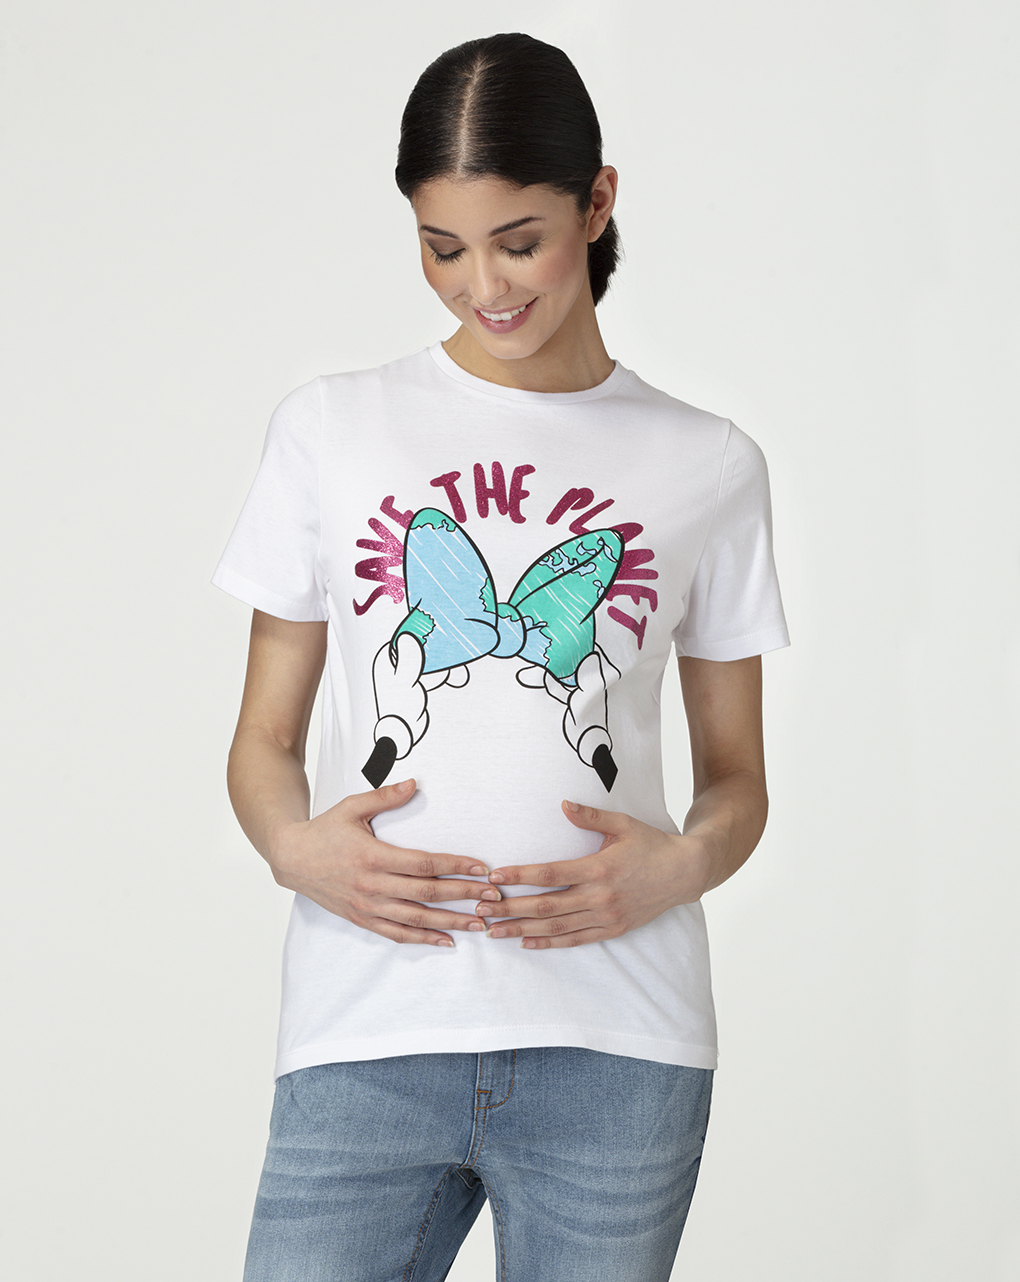 T-shirt premaman con stampa glitter - Prénatal